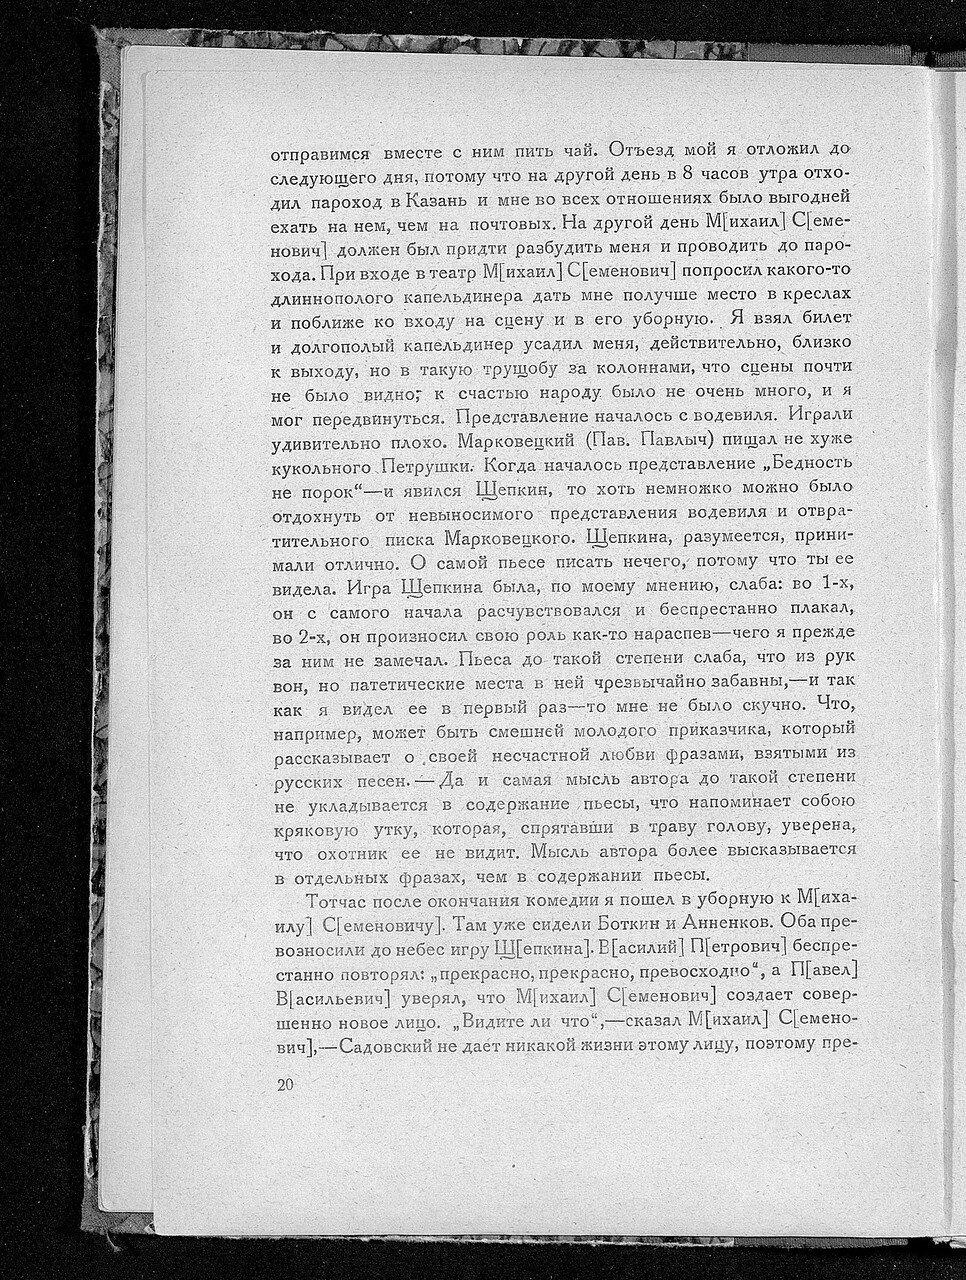 https://img-fotki.yandex.ru/get/484172/199368979.a0/0_21430f_a3abbb34_XXXL.jpg